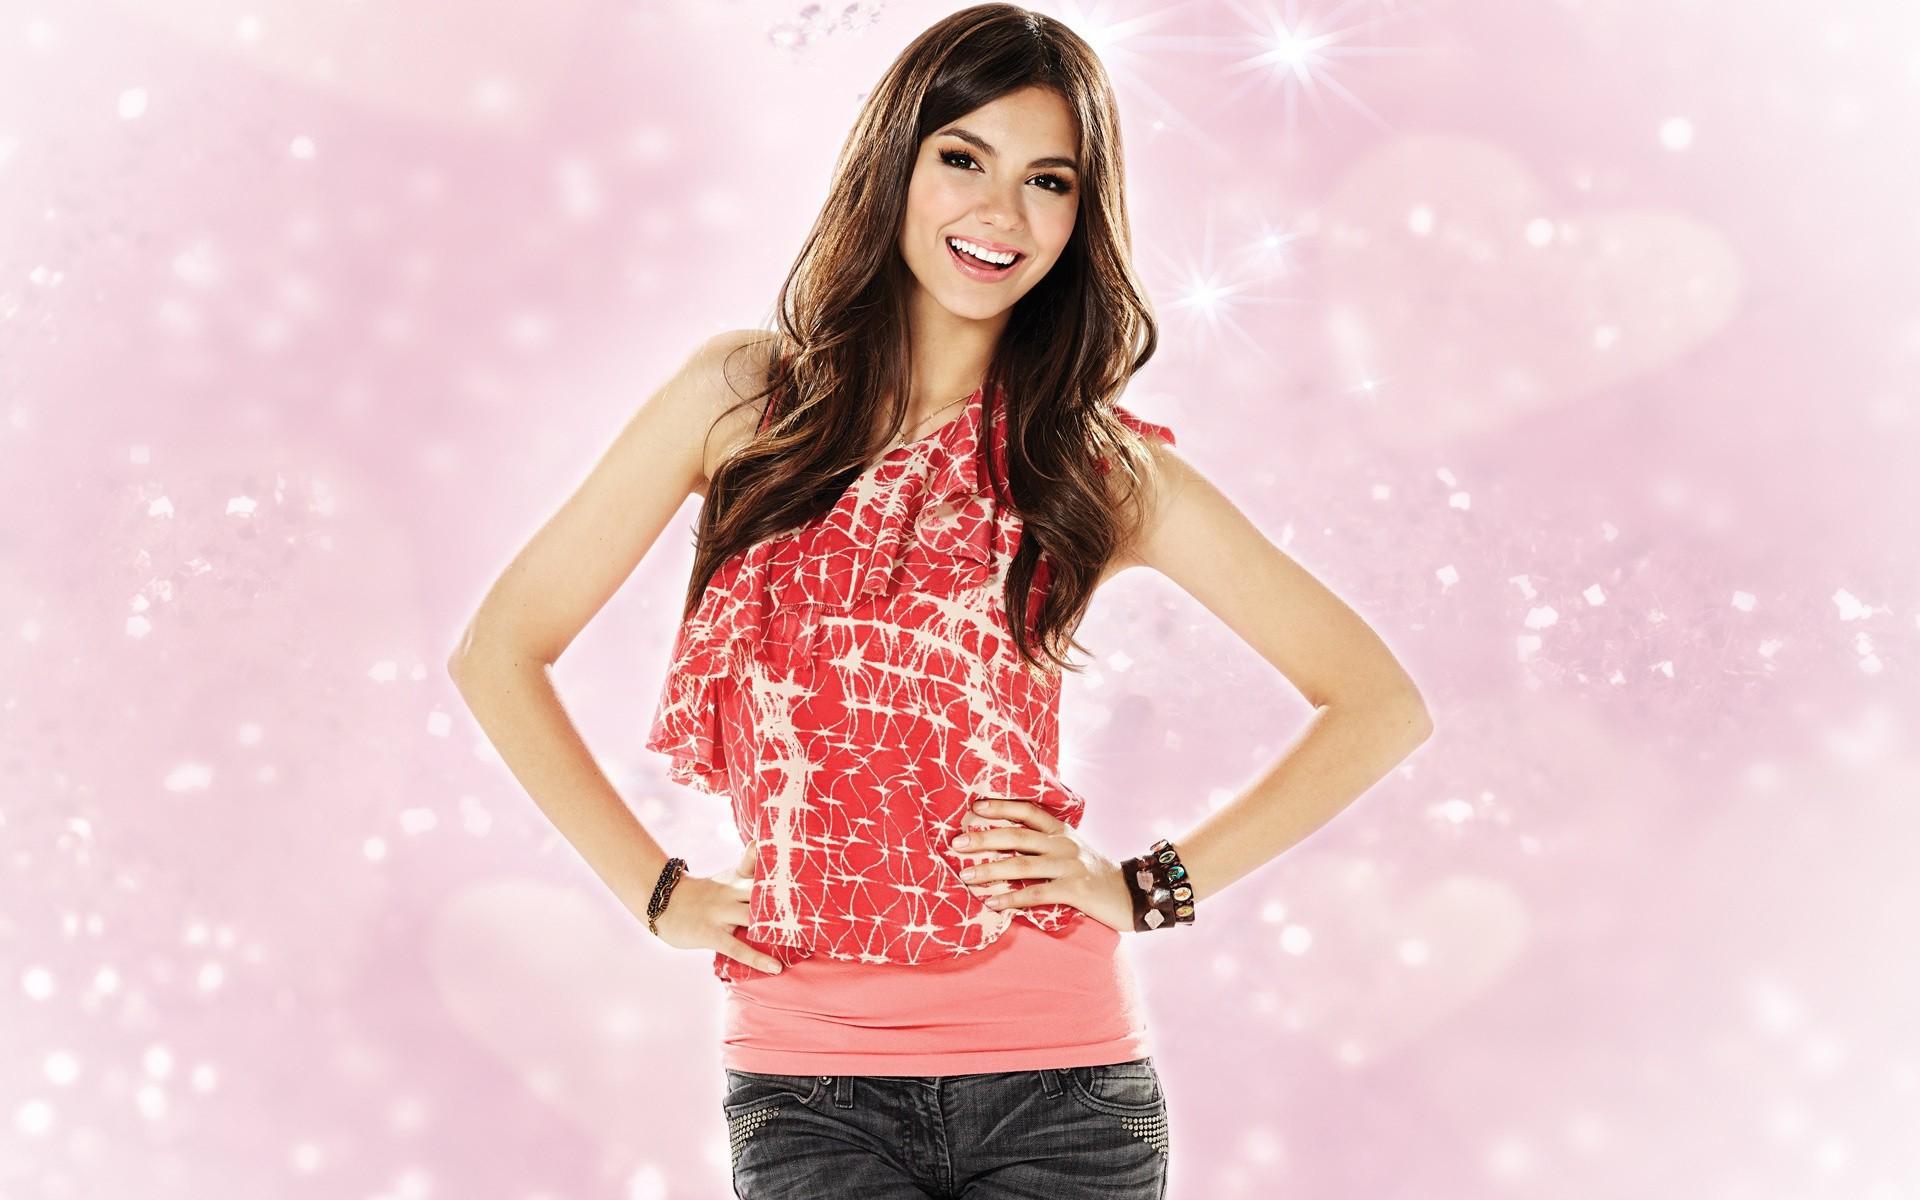 Victoria Justice Model HD Celebrities 4k Wallpapers Images